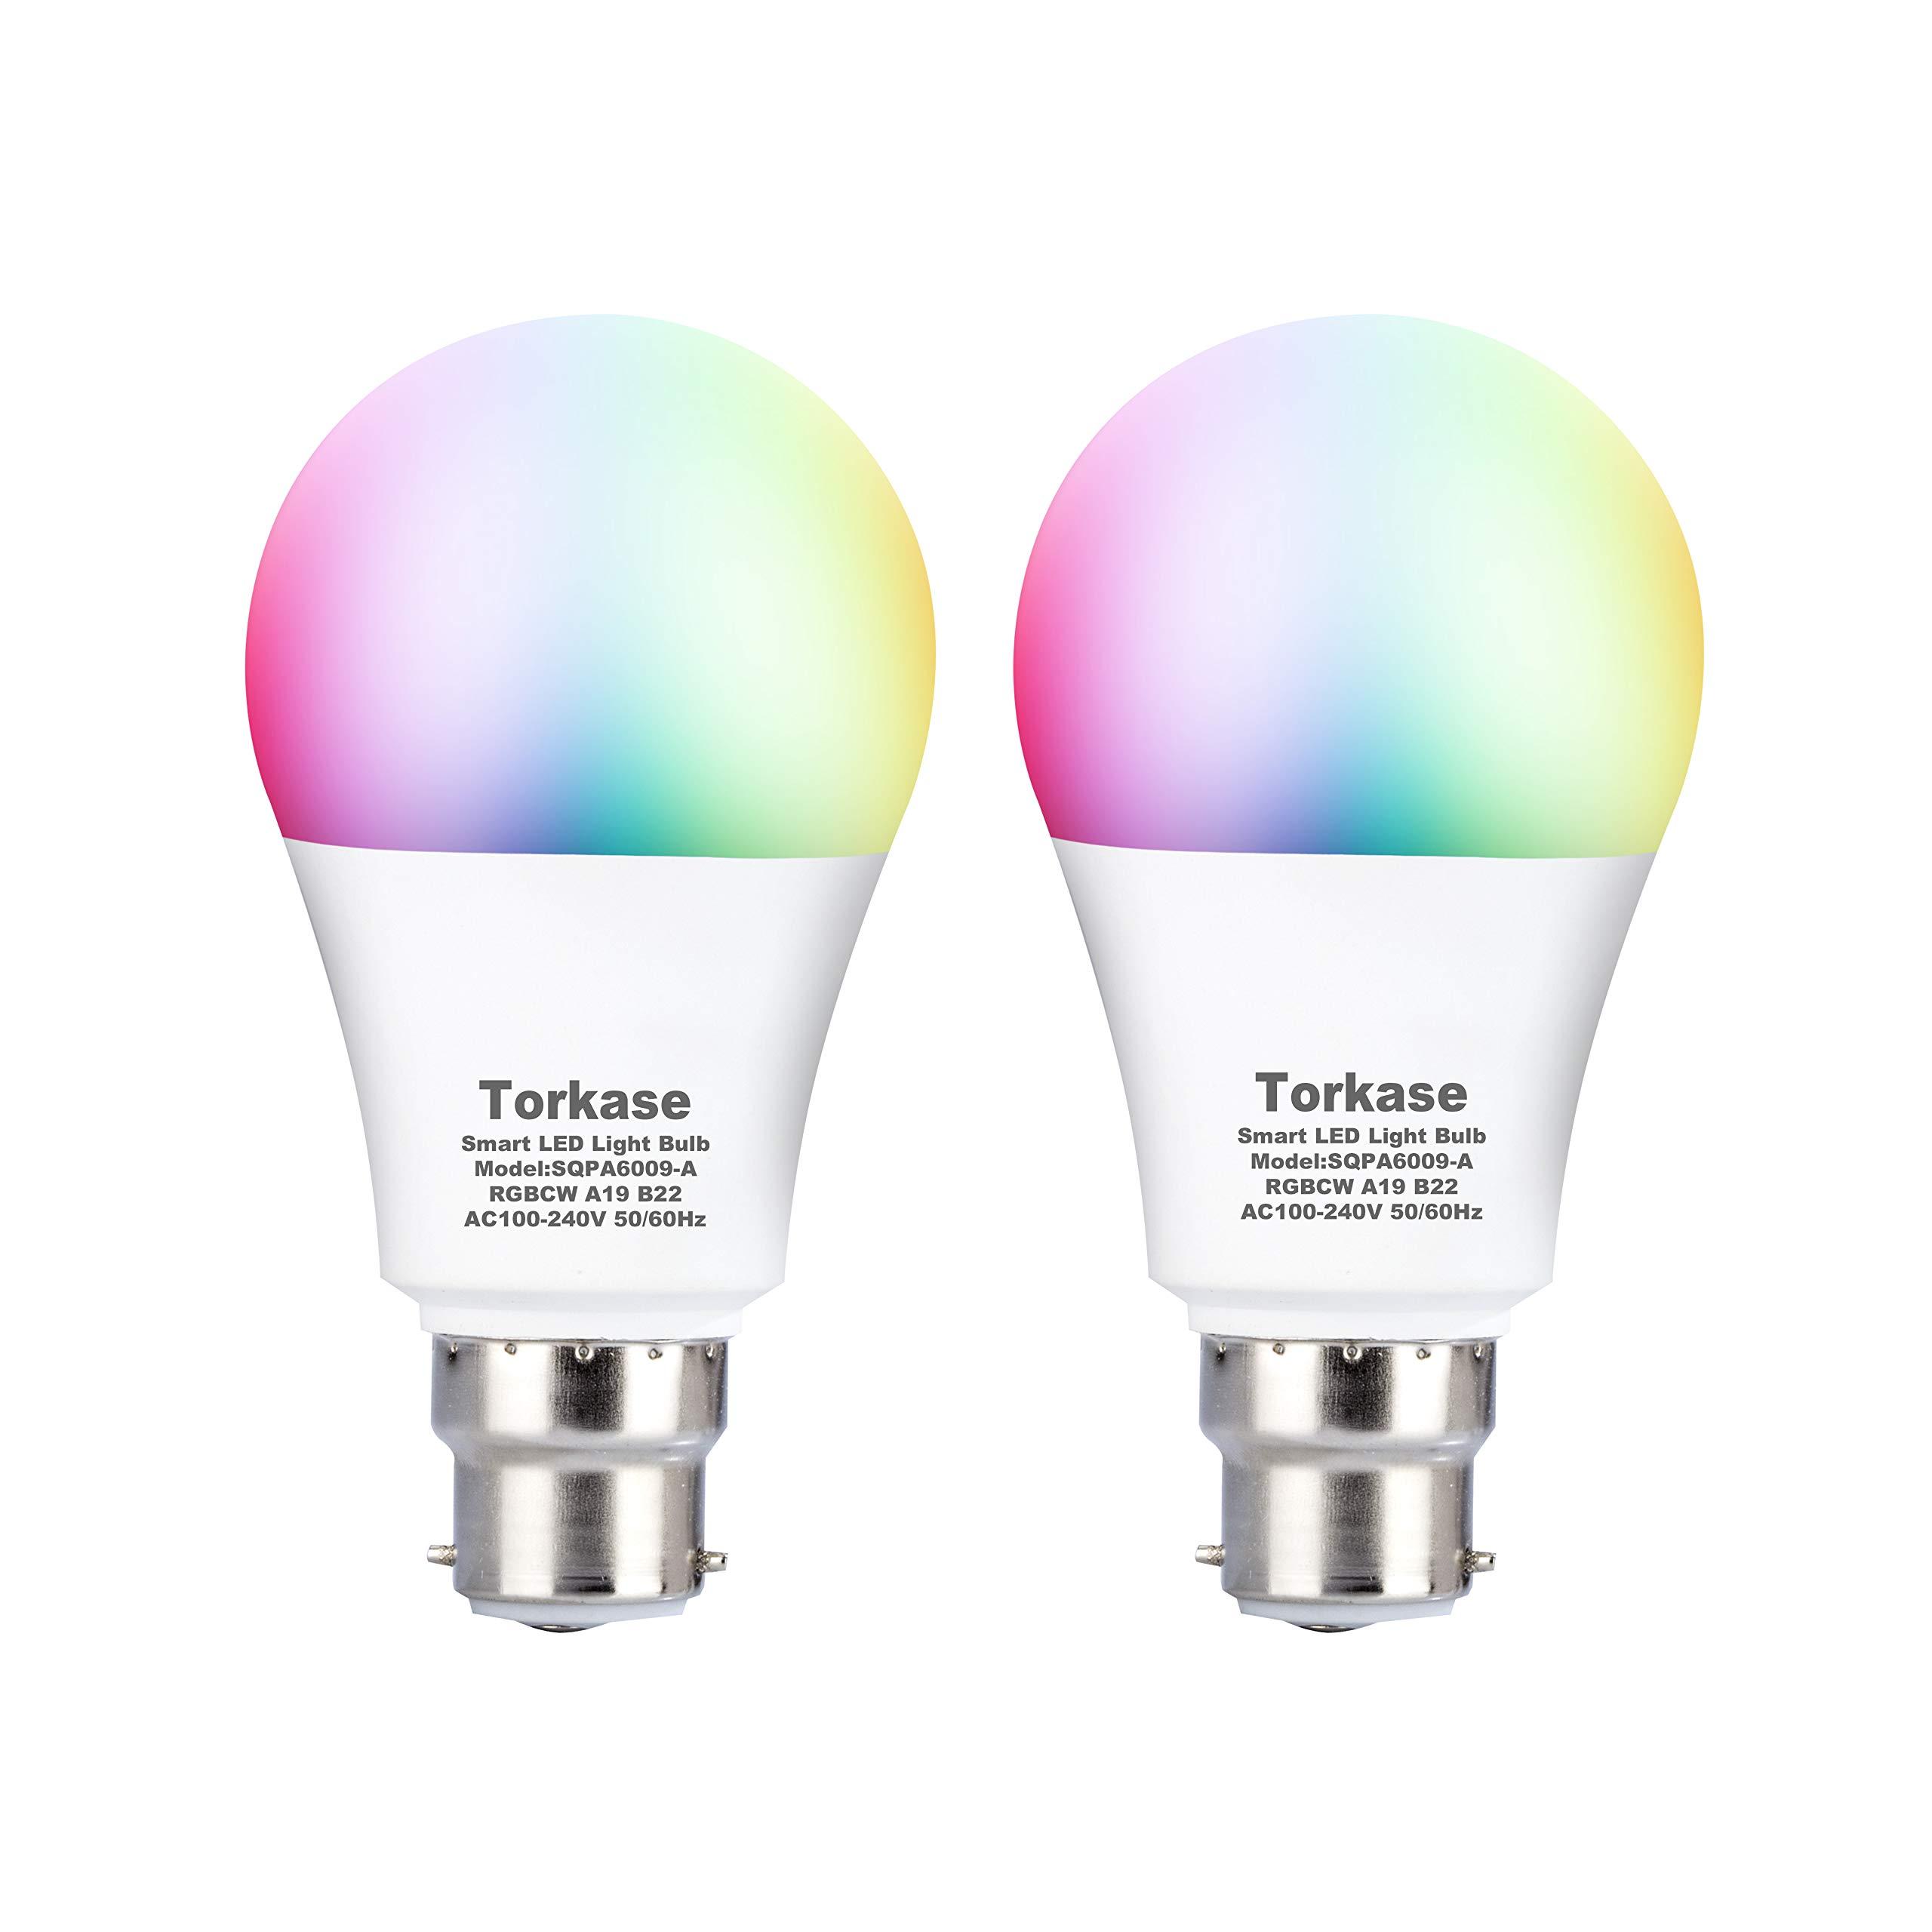 Torkase Smart Light Bulb